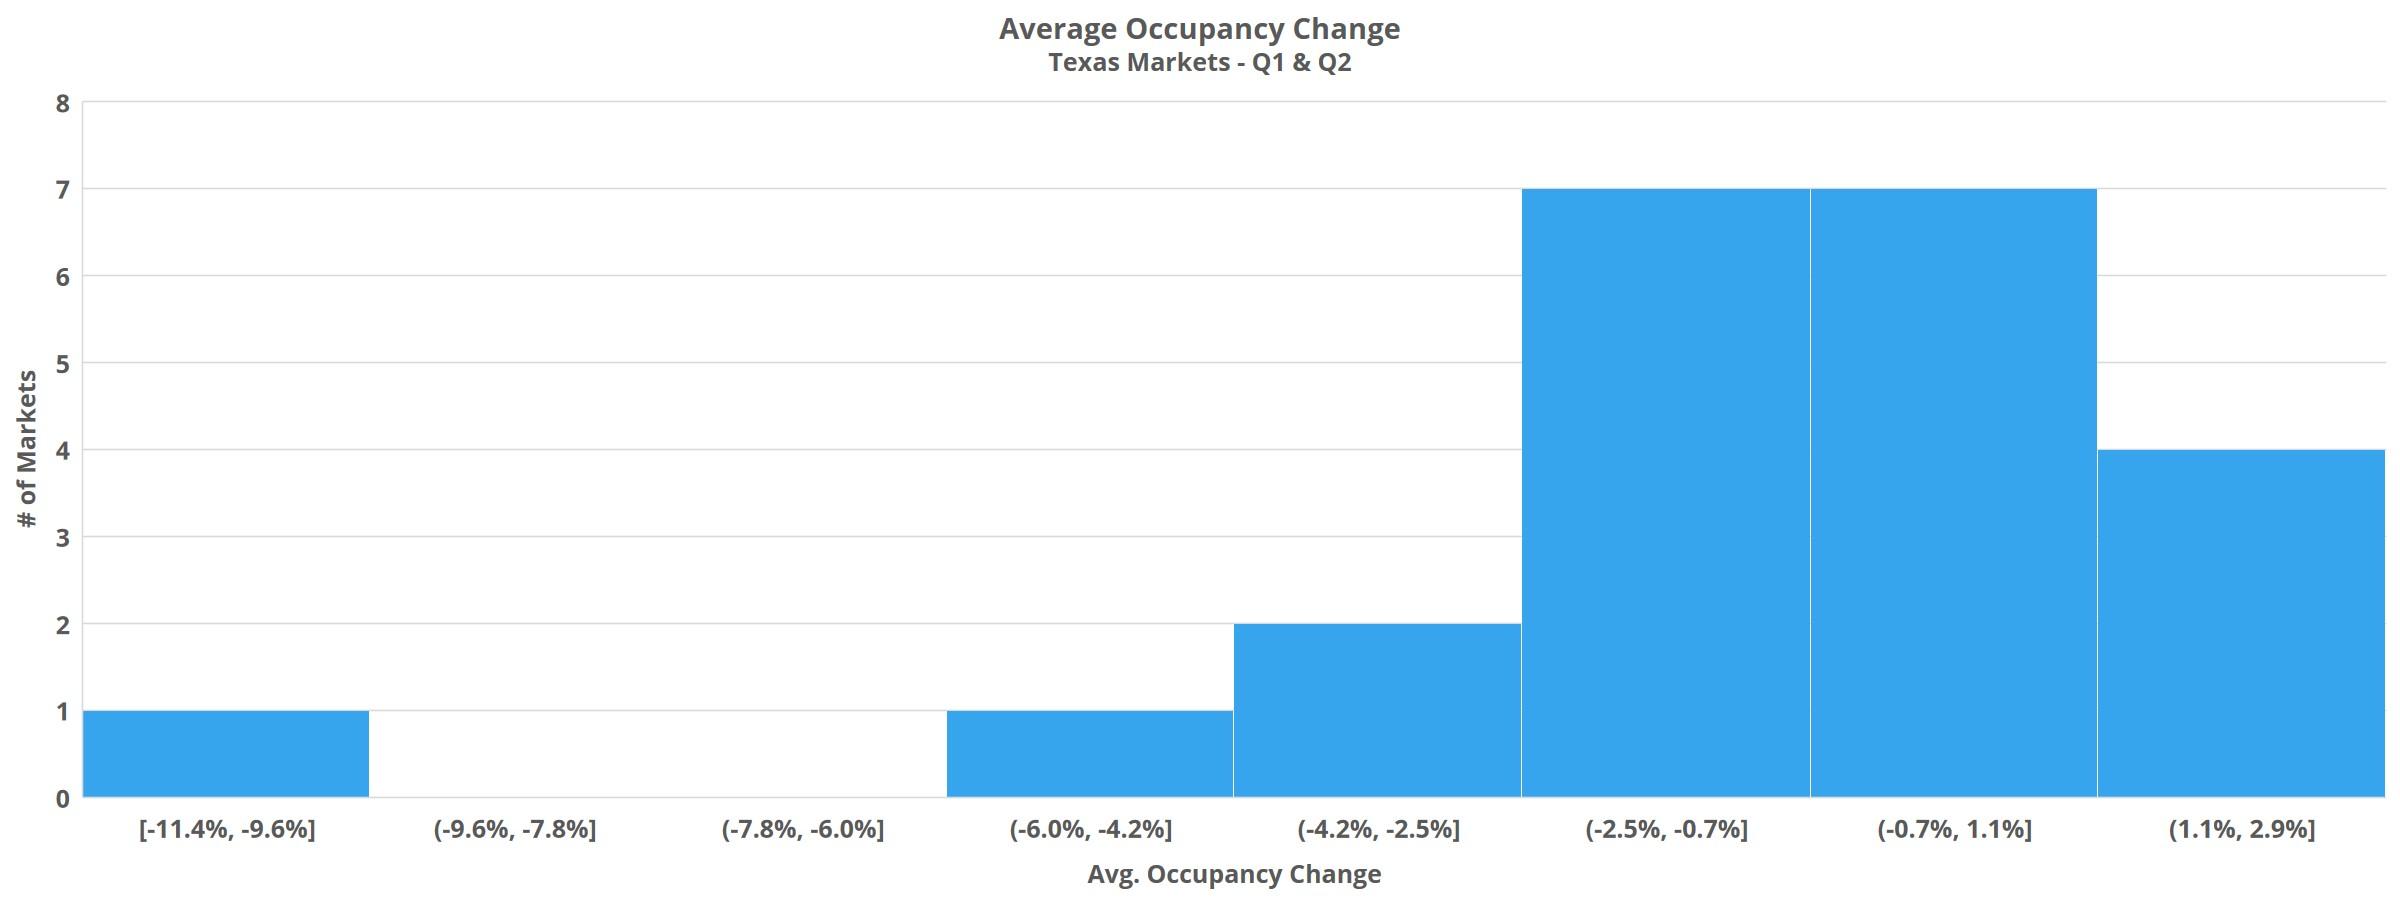 Average Occupancy Change